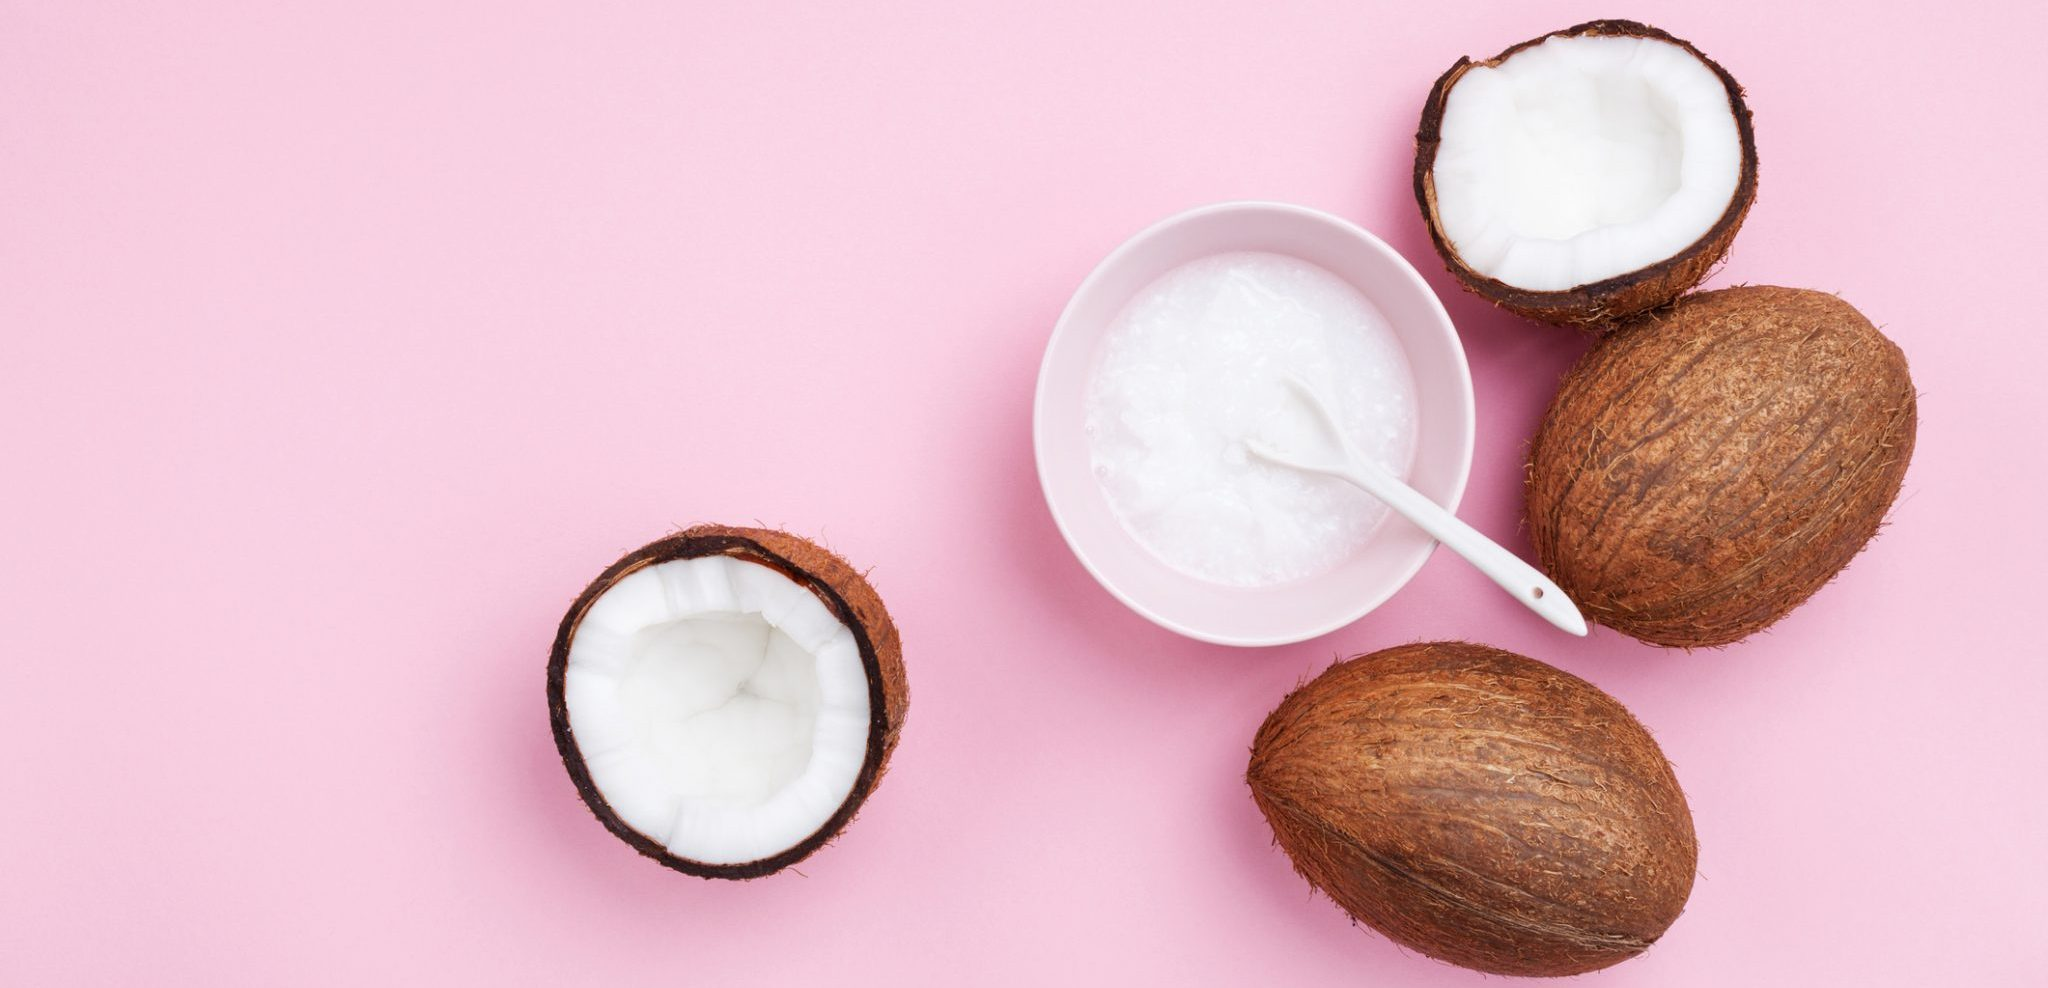 Coconut Oil Wraps Uncovered: the Next Beauty Secret?